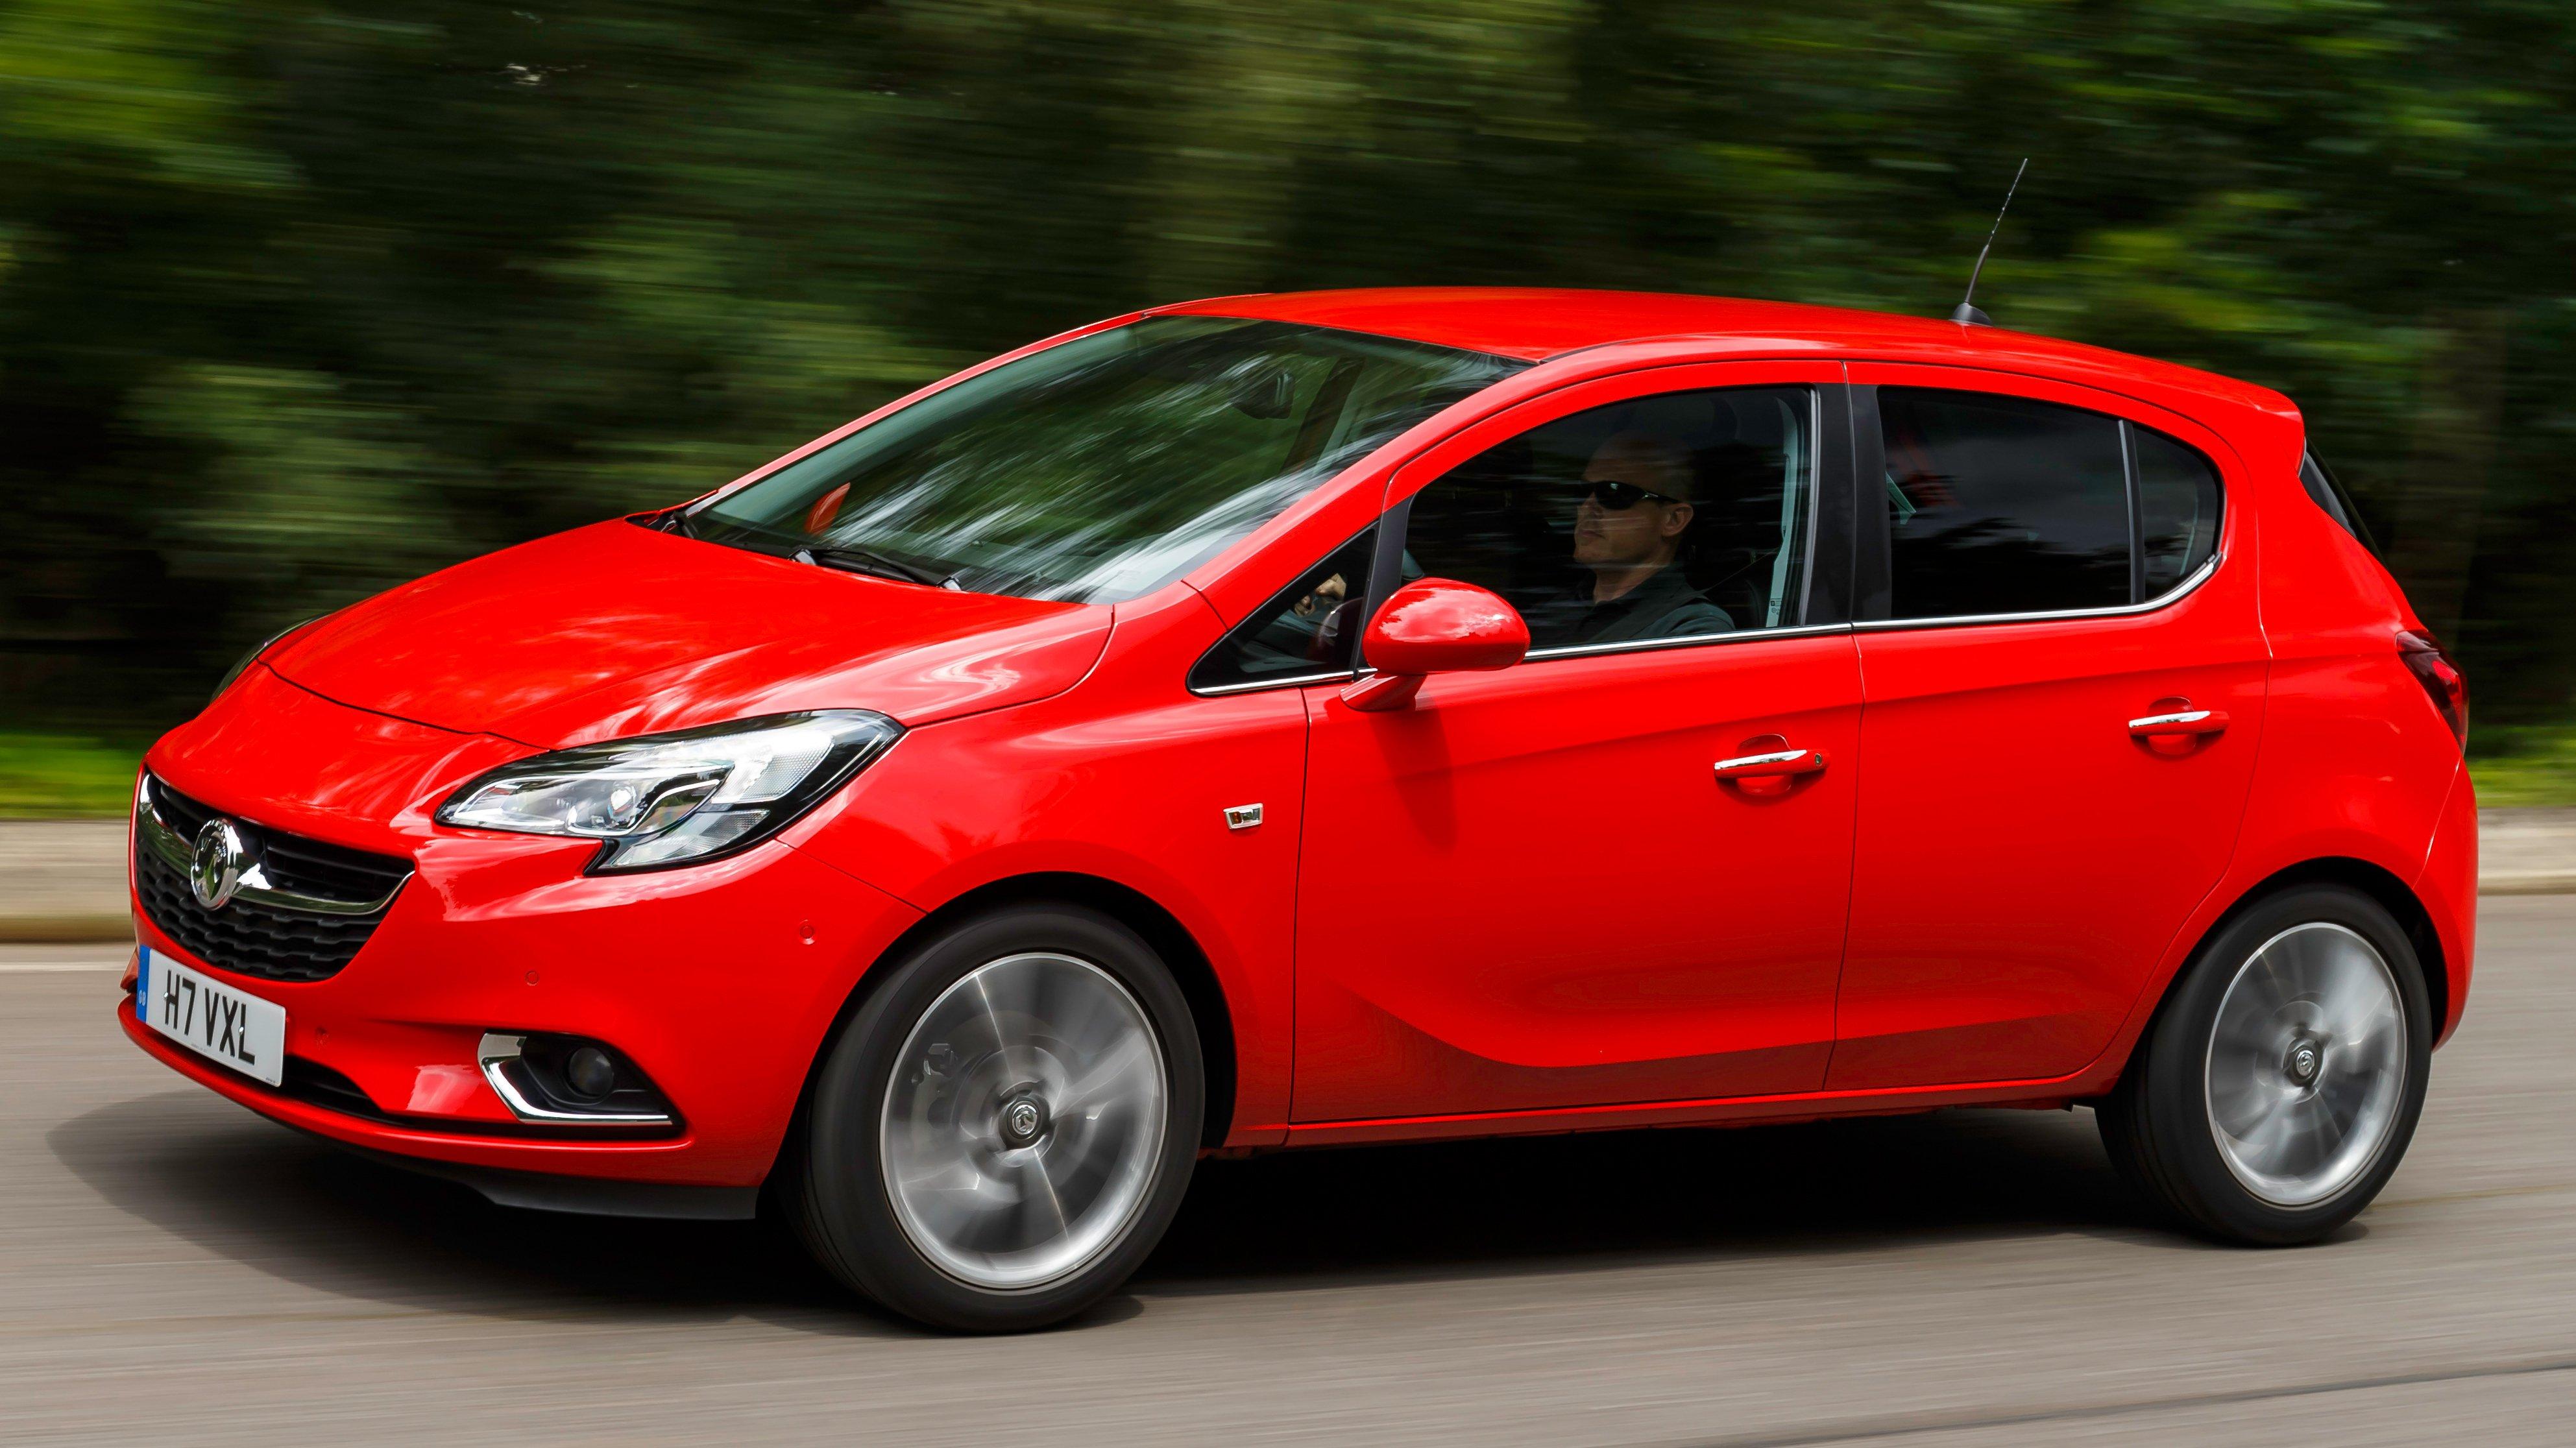 Vauxhall/Opel Corsa – fourth-gen supermini unveiled Image 257657